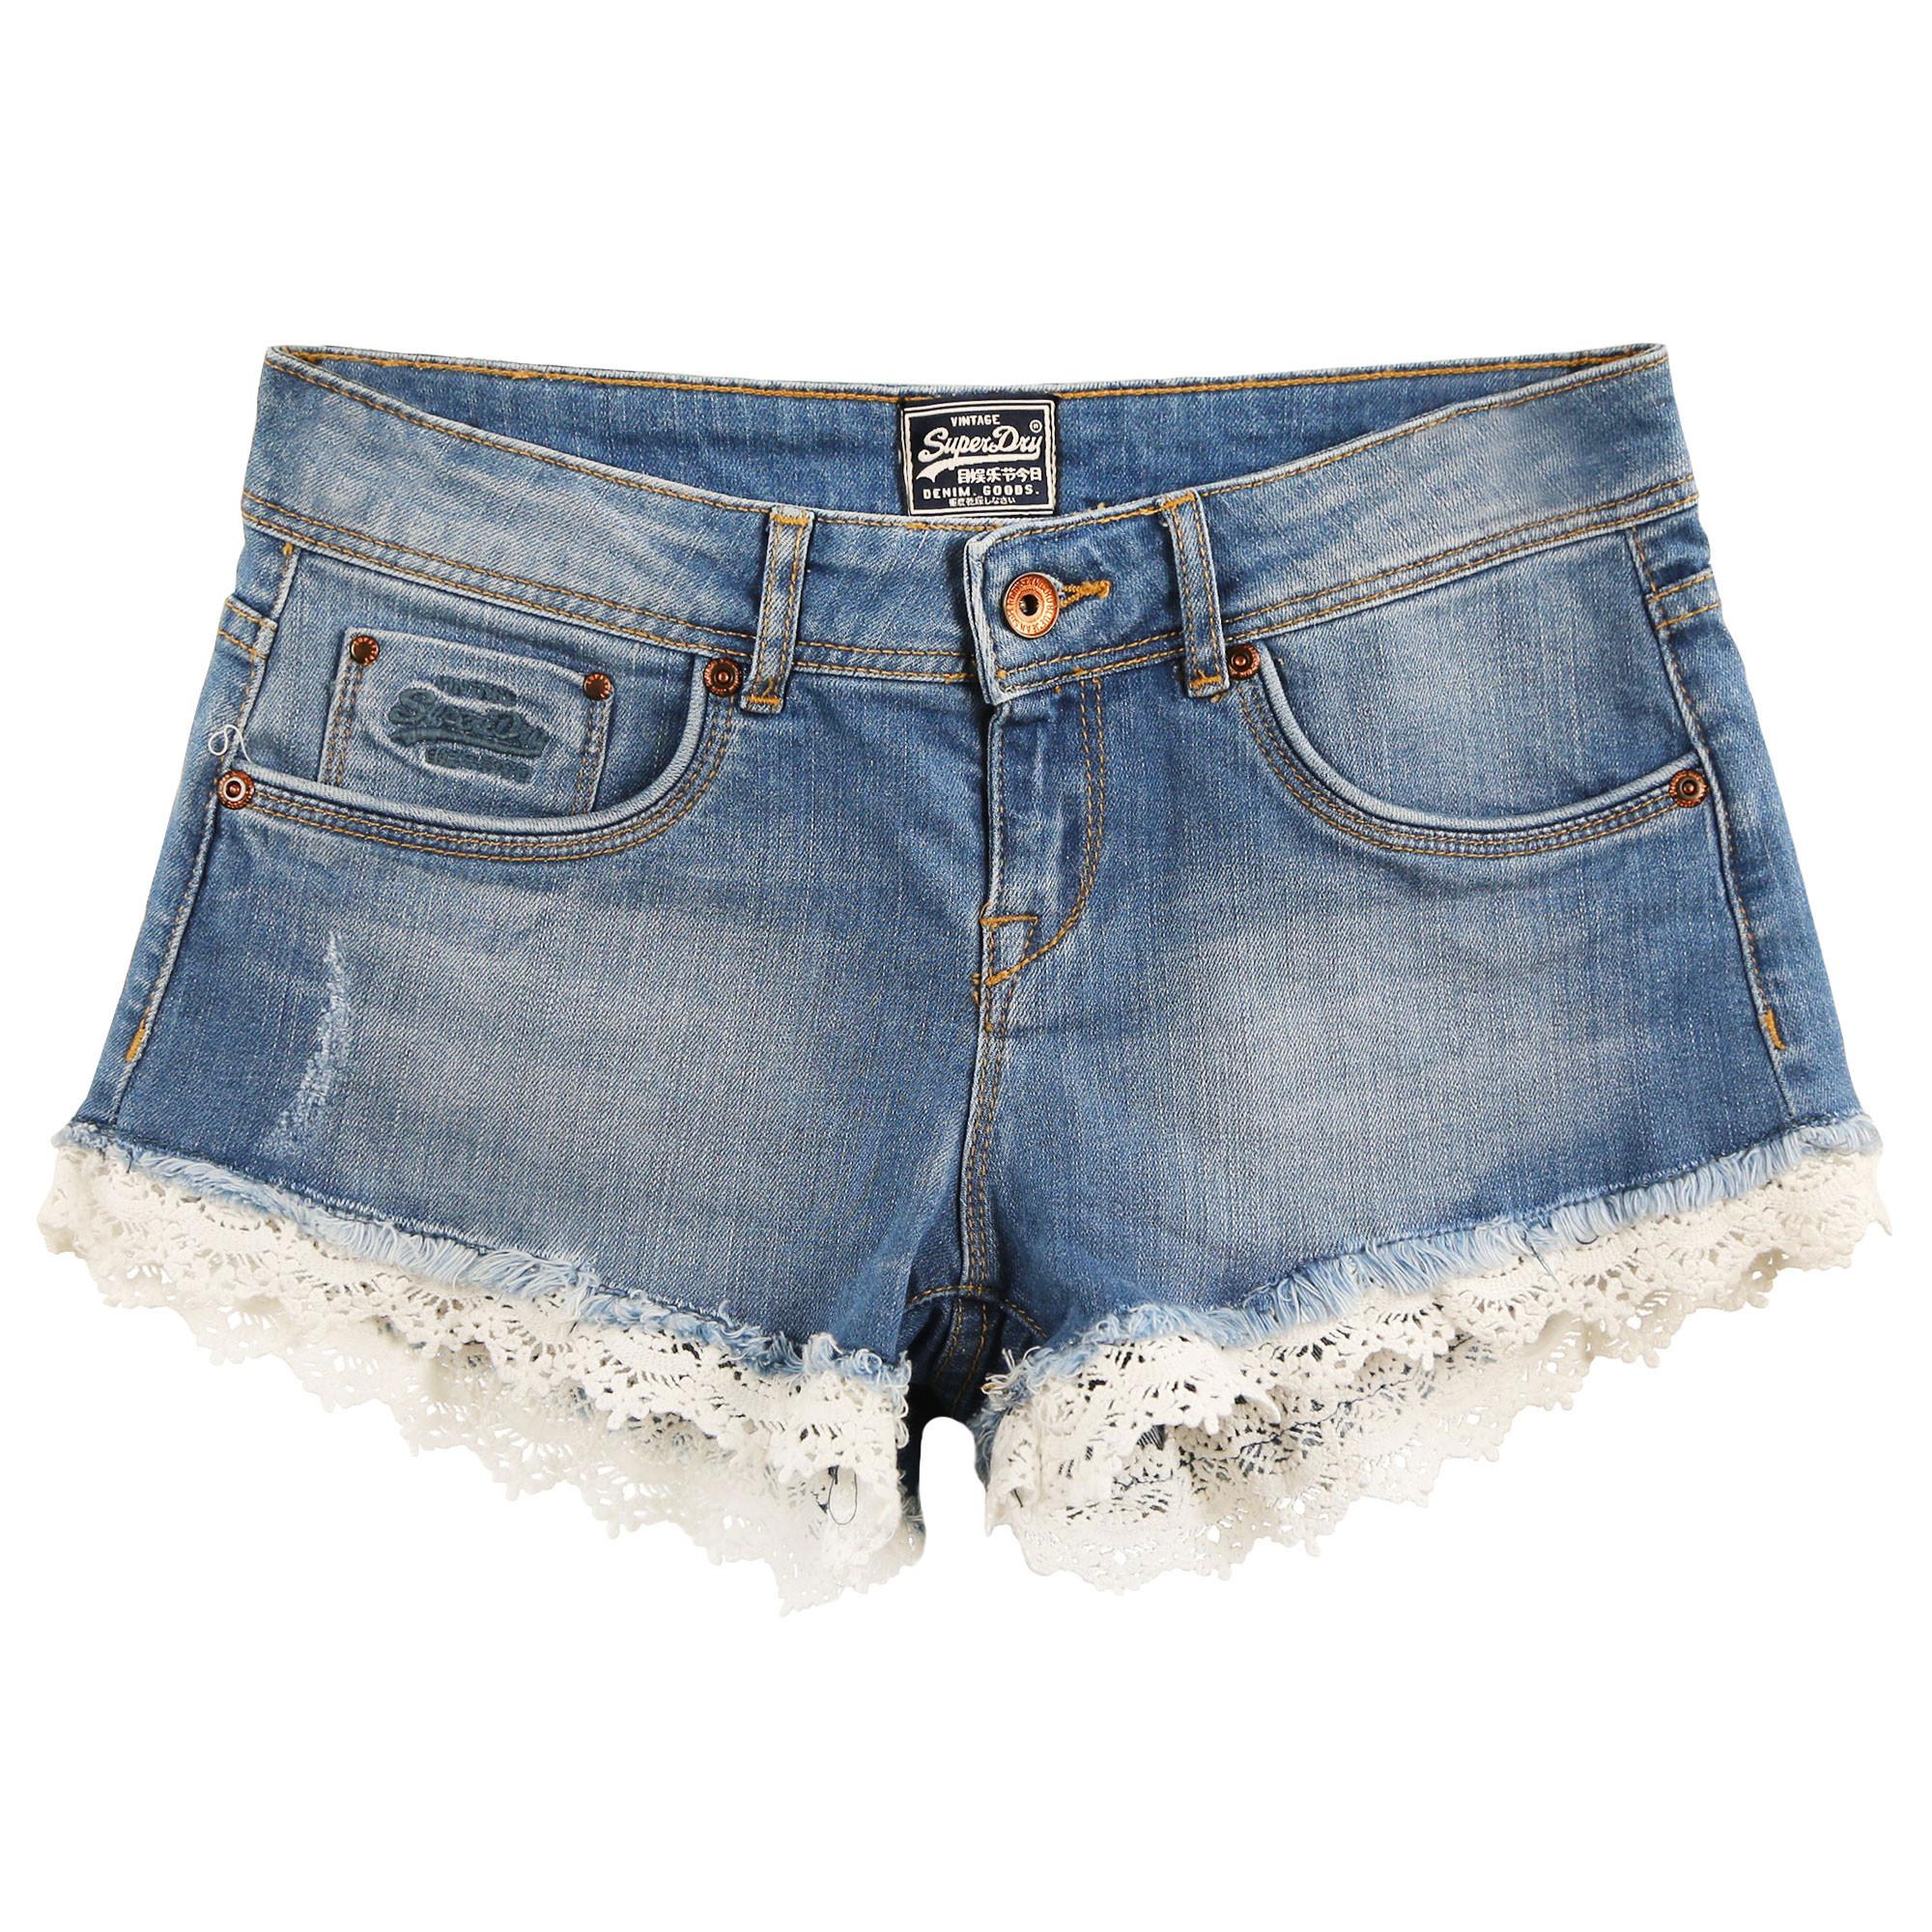 Bleu Hot Short Lace Jeans Shorts Superdry Pas Cher Femme Pz4qawU 51fabd96cdd